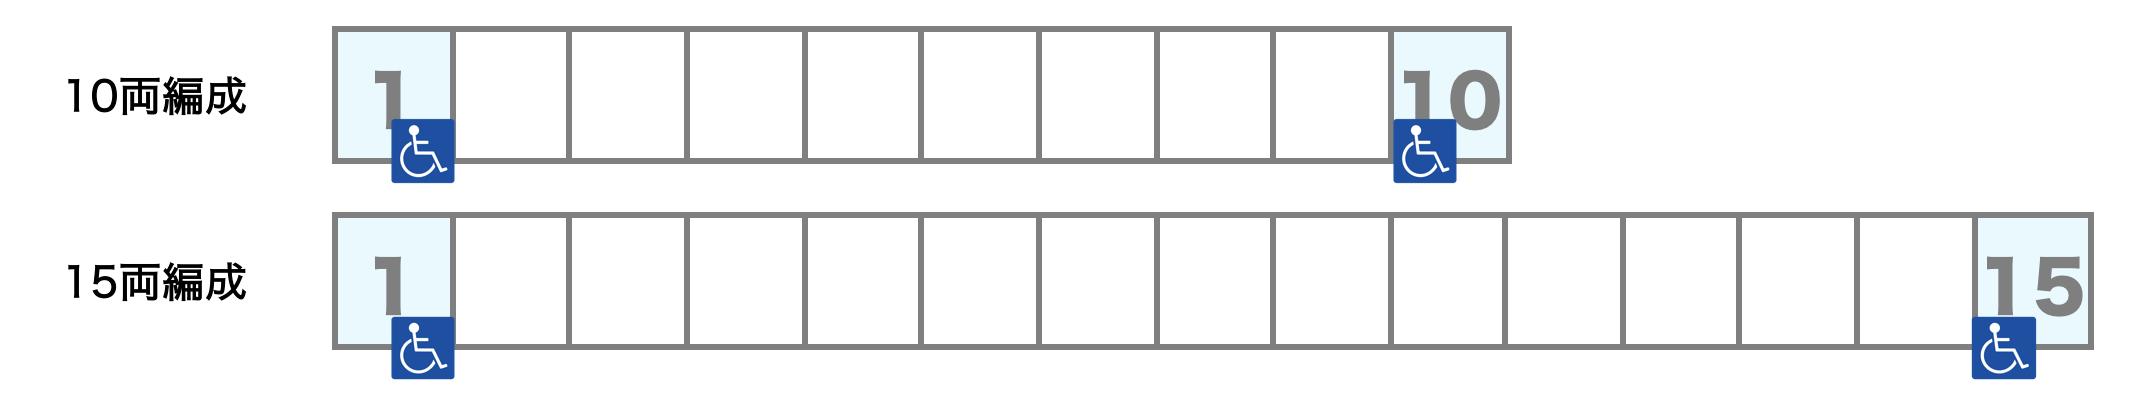 常磐線快速車両_車椅子スペース(北千住)図